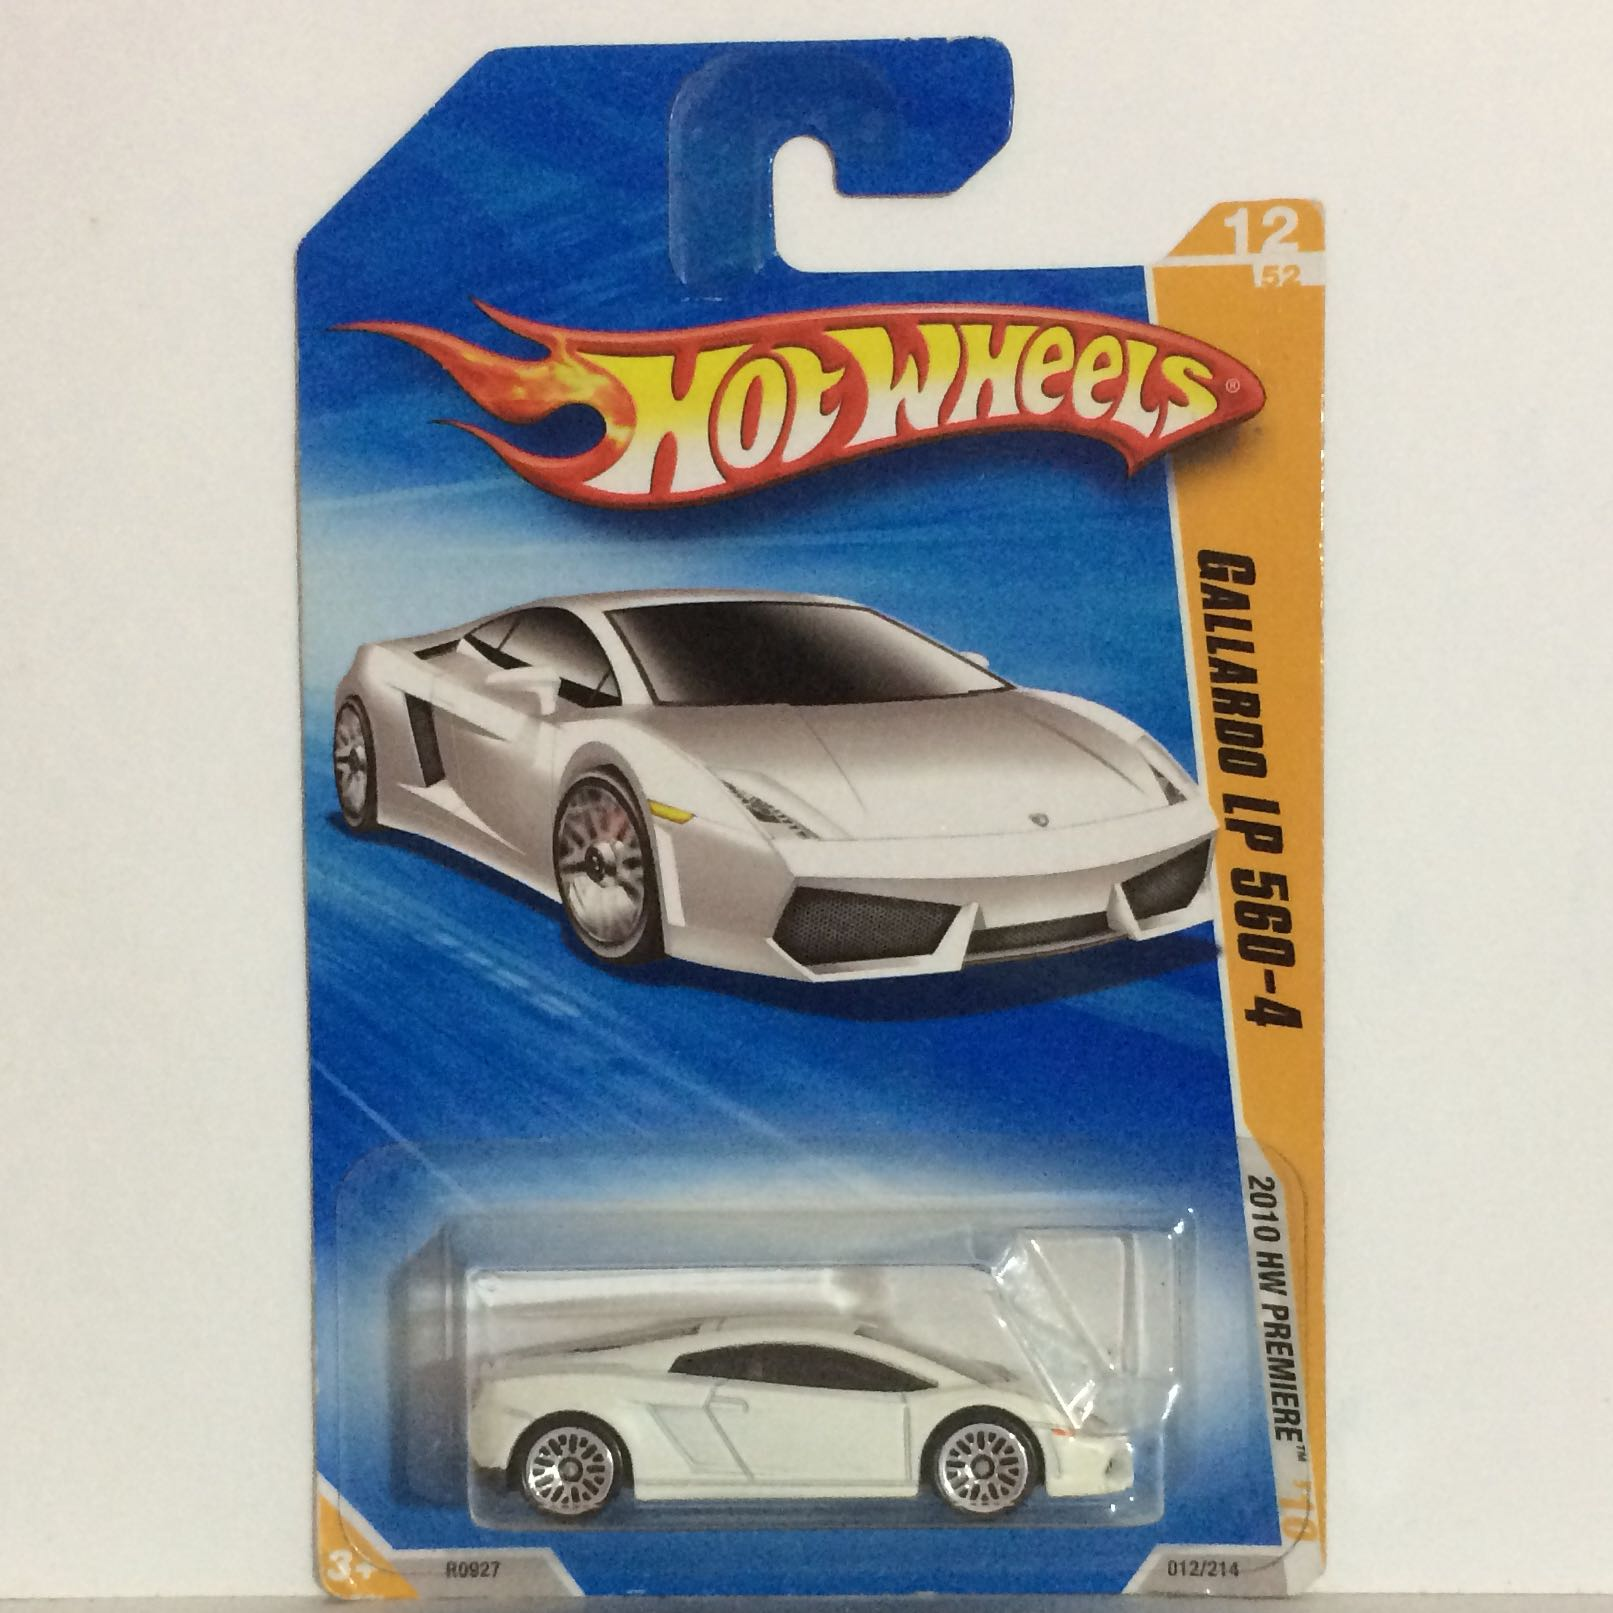 Hot Wheels Lamborghini Gallardo Lp560 4 Toys Games Other Toys On